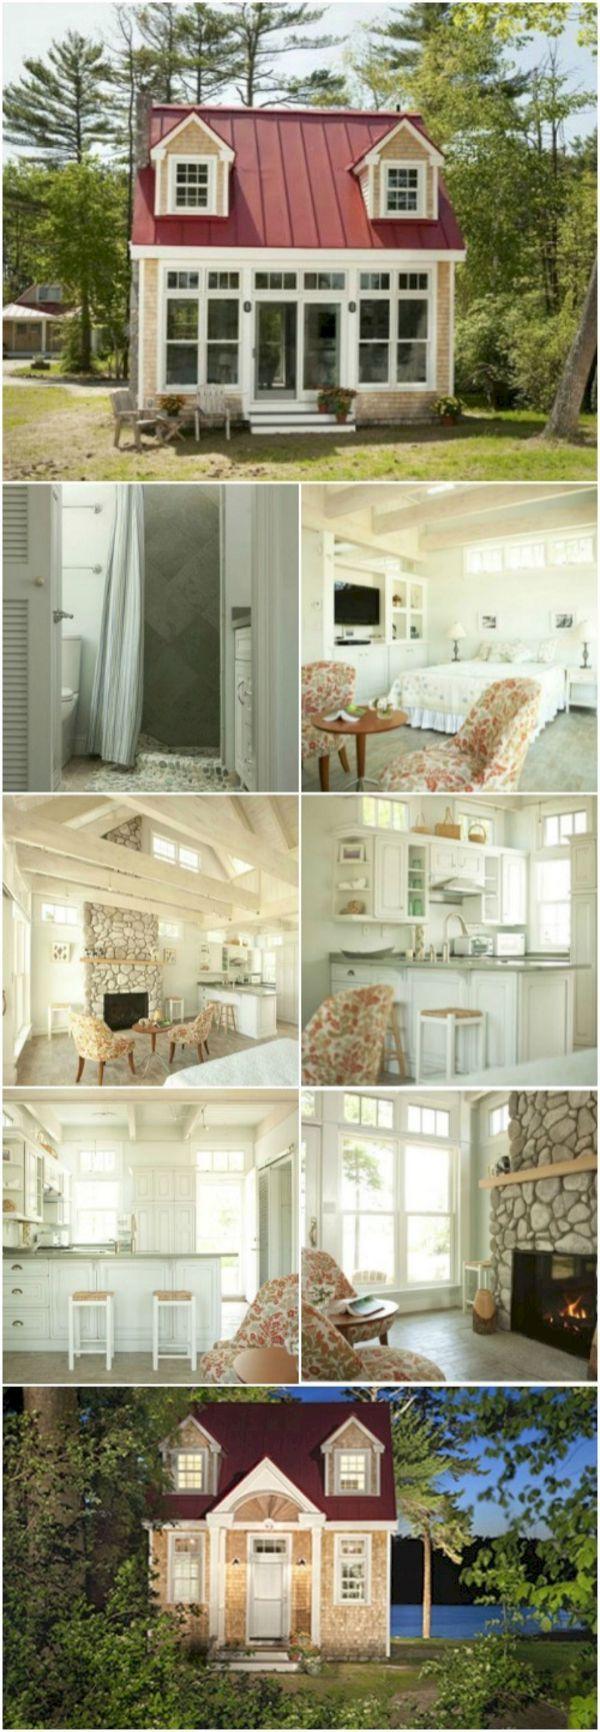 70 Marvelous Tiny Houses Design That Maximize Style And Function   Casa  Aconchegante, Casa Sustentável E Sonhos